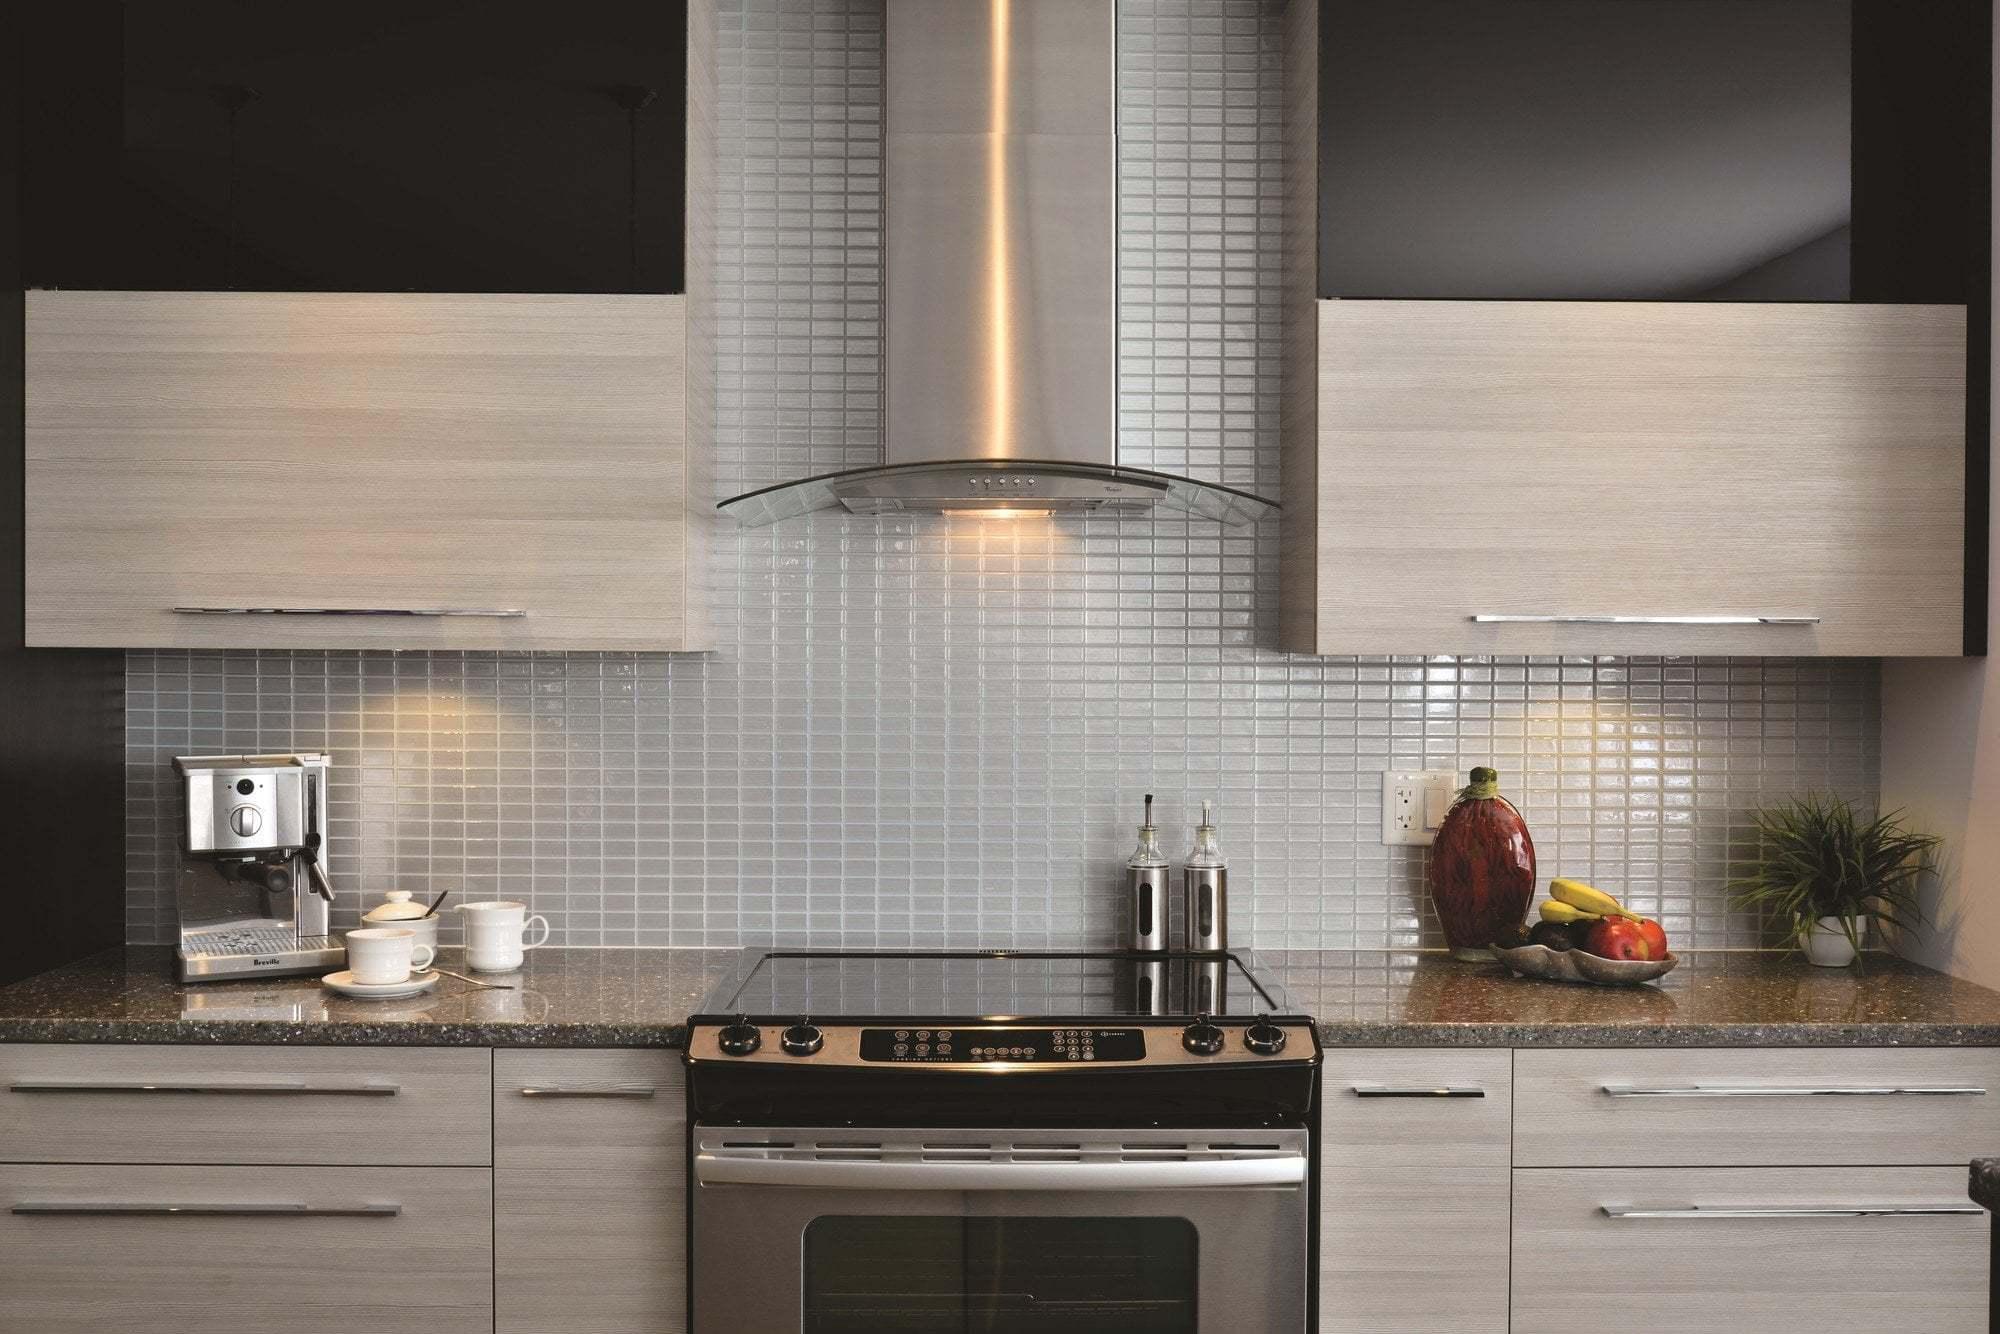 Smart-Tiles-Mosaik-Self-Adhesive-Wall-Tile-in-